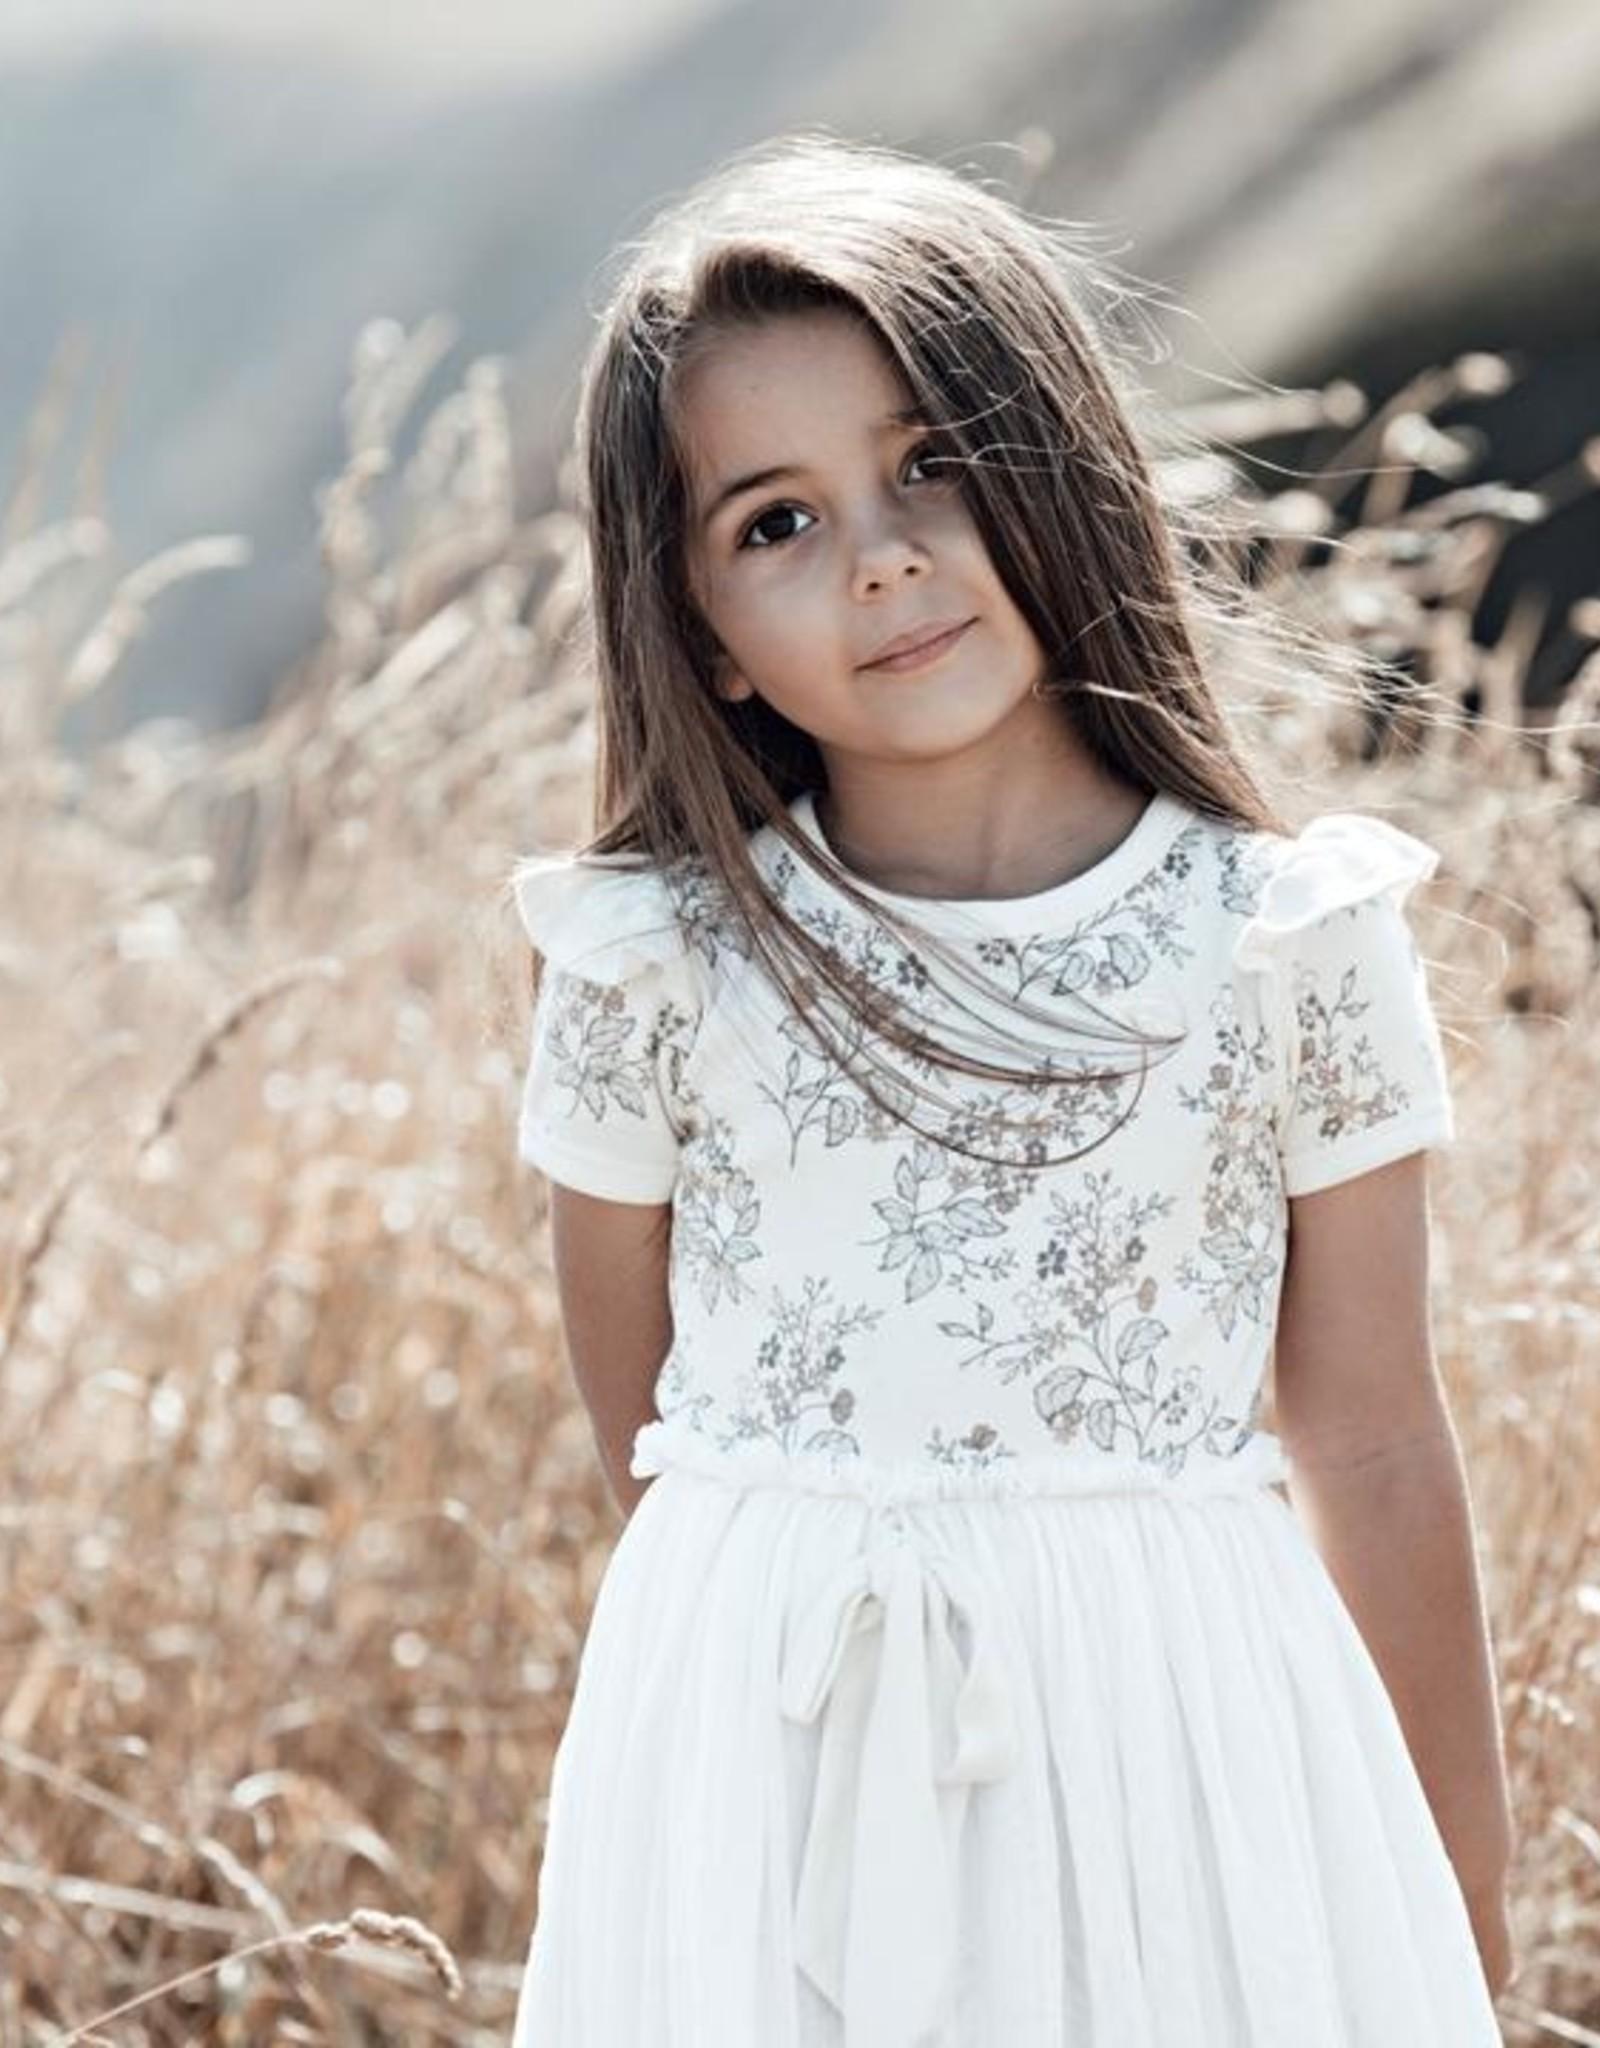 Aster & Oak Aster & Oak - Summer Floral Tutu Dress